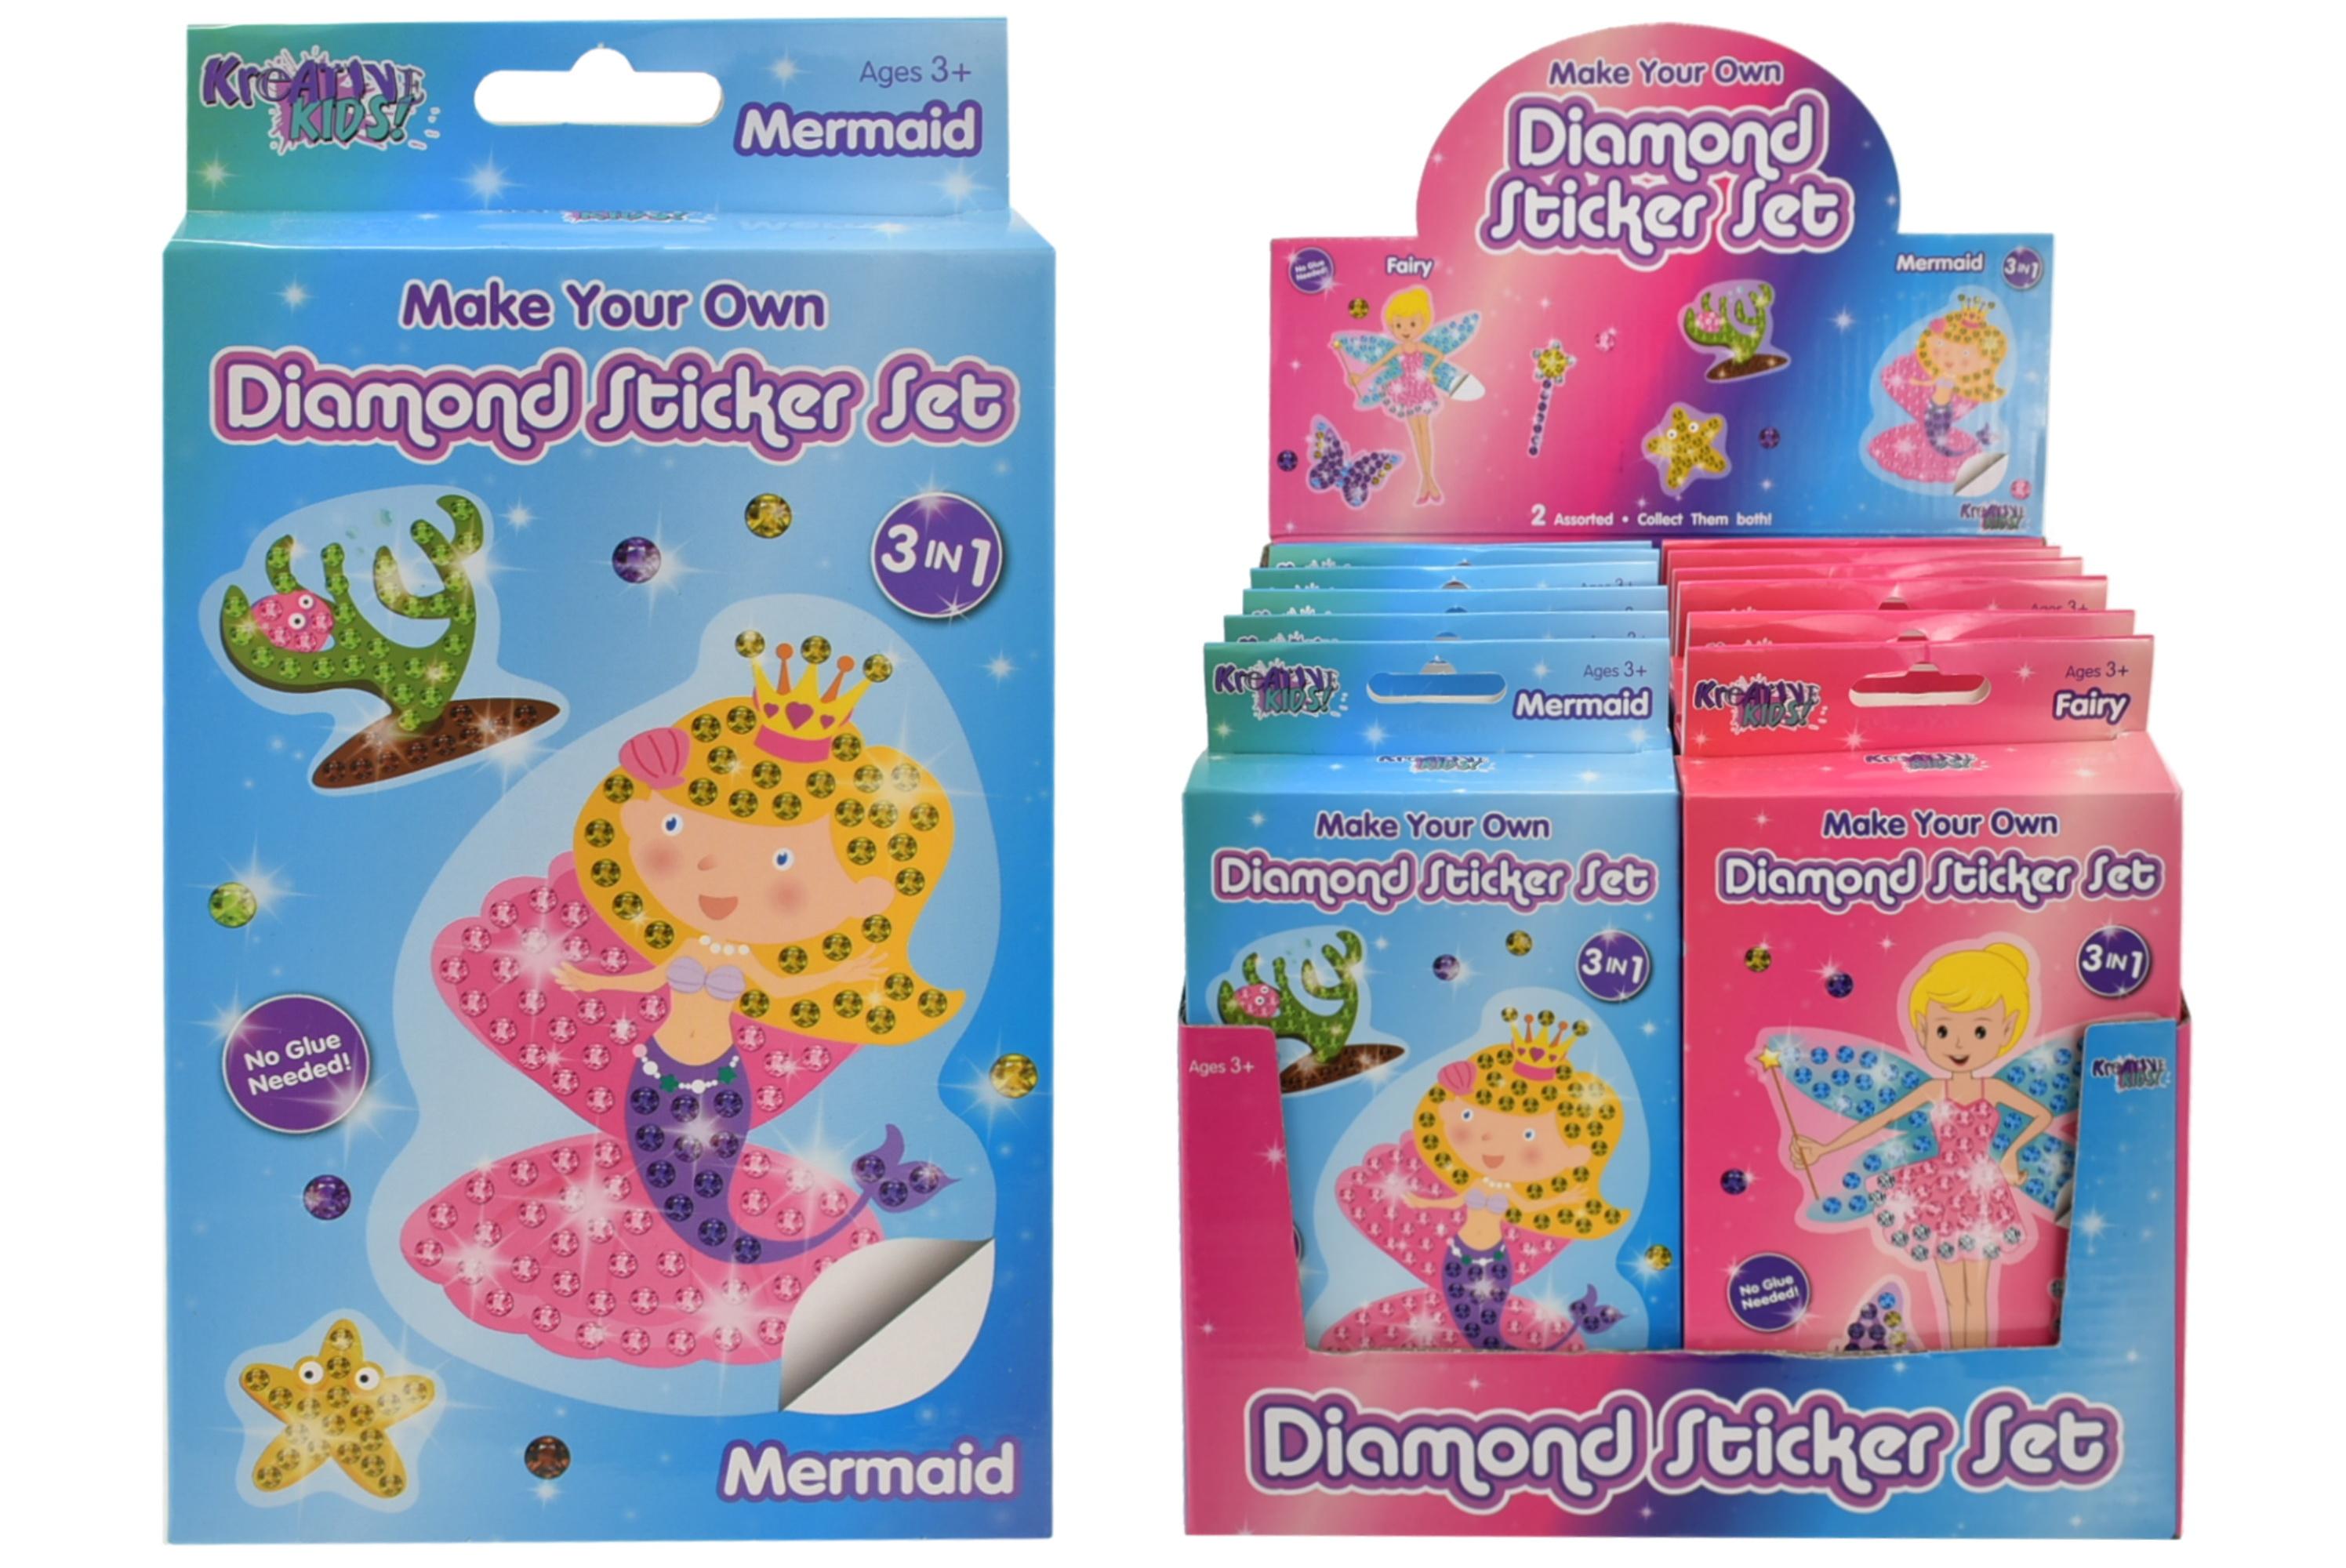 Diamond Sticker Set (3in1)